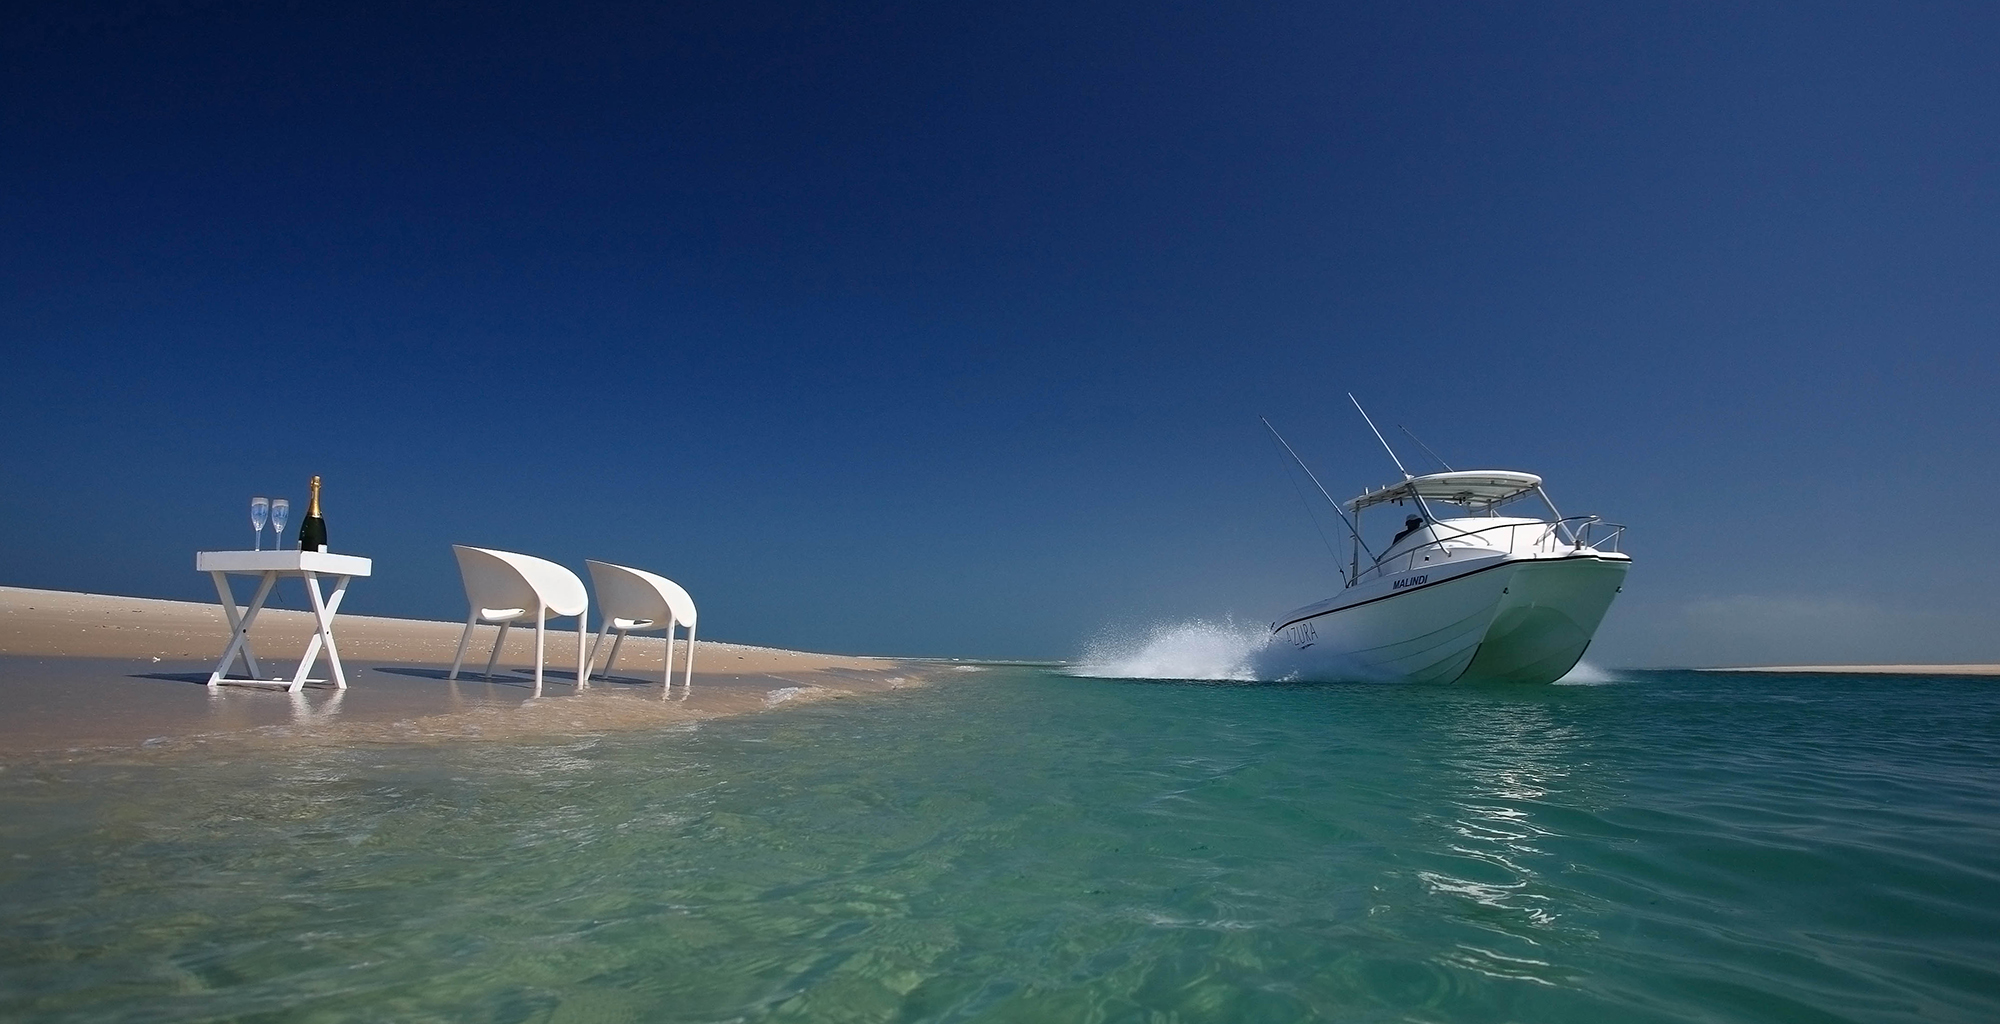 Mozambique-Bazaruto-Archipelago-Azura-Benguerra-Presidential-Coastal-Dining-Boat